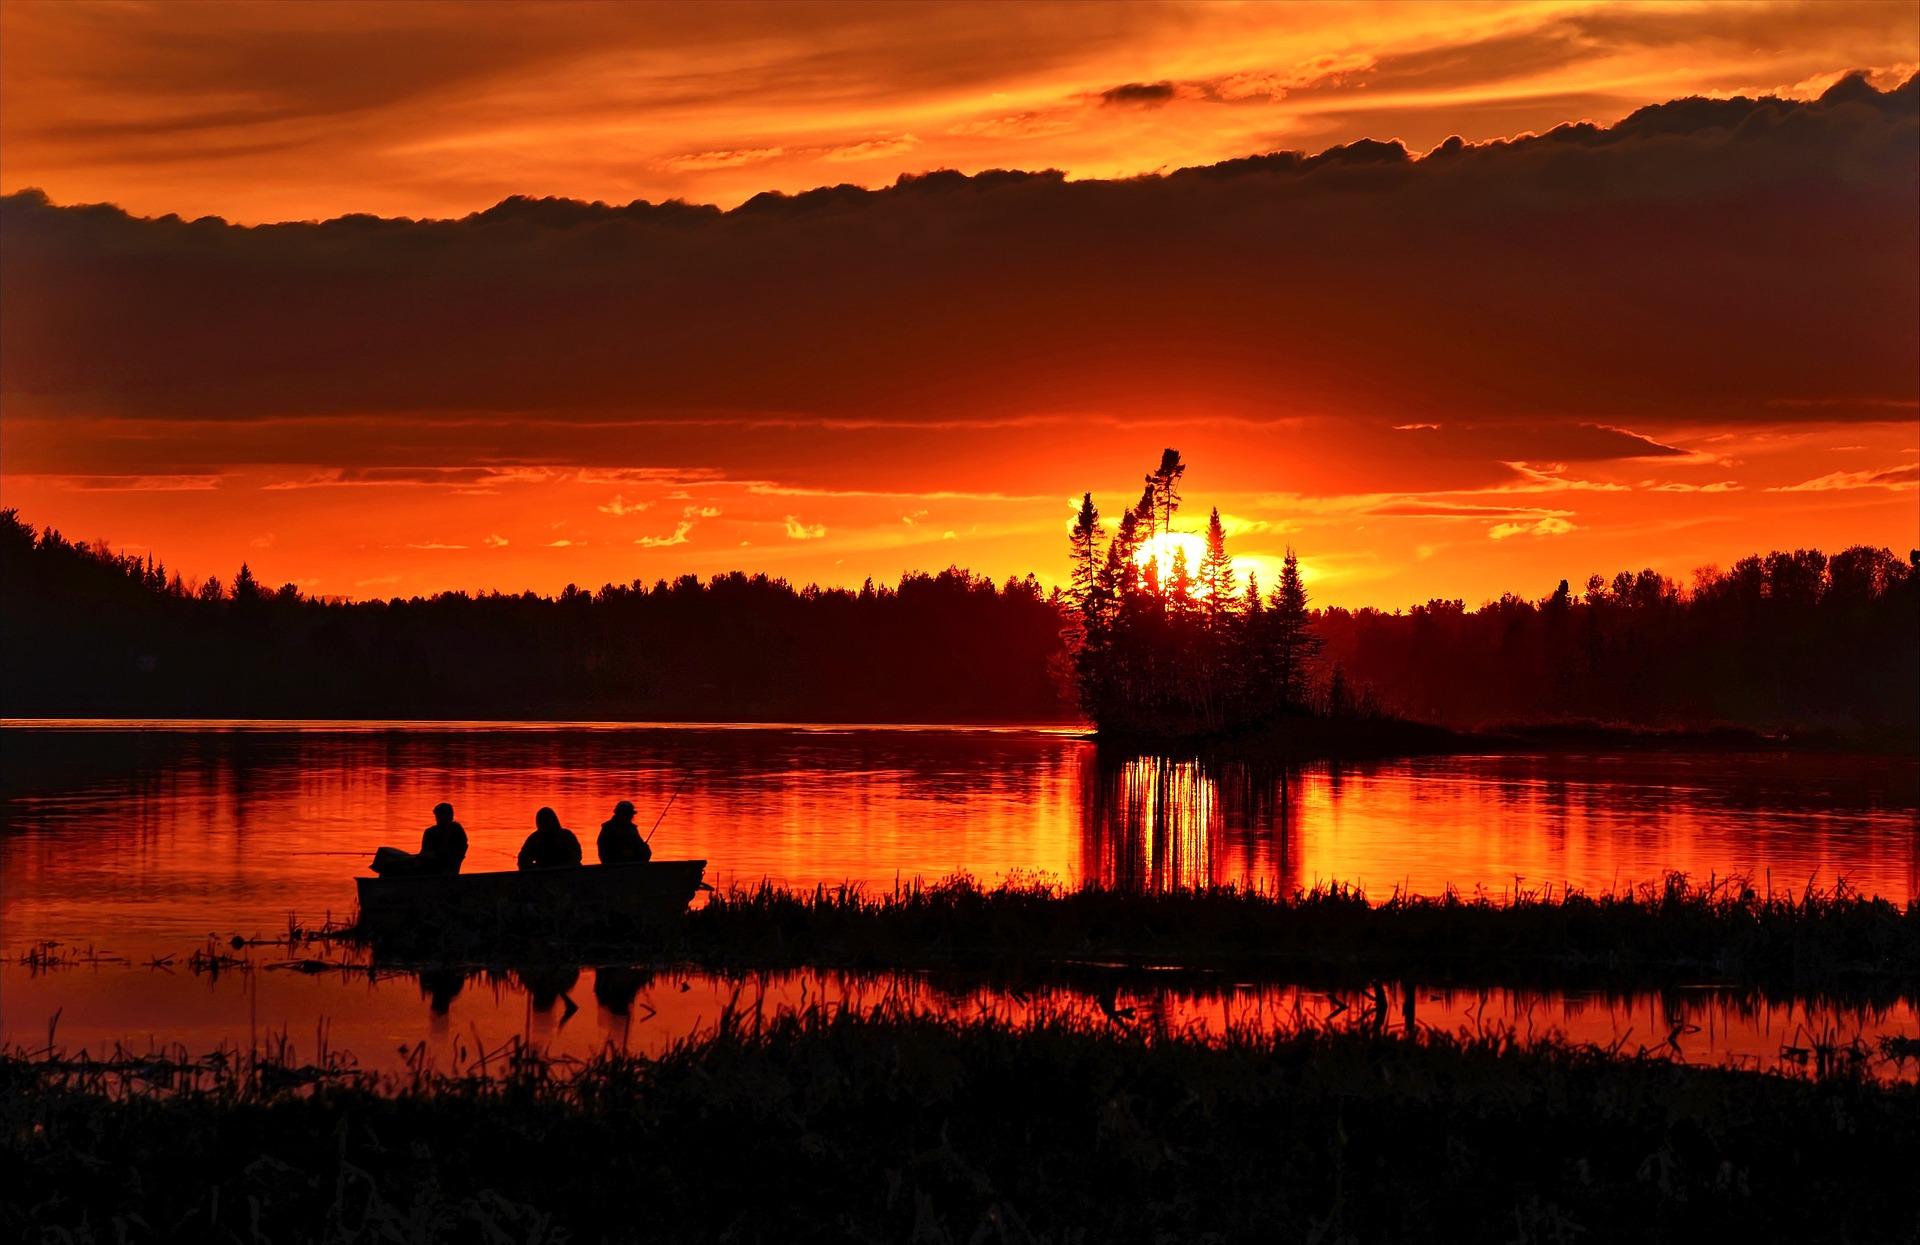 sunset-1421010_1920